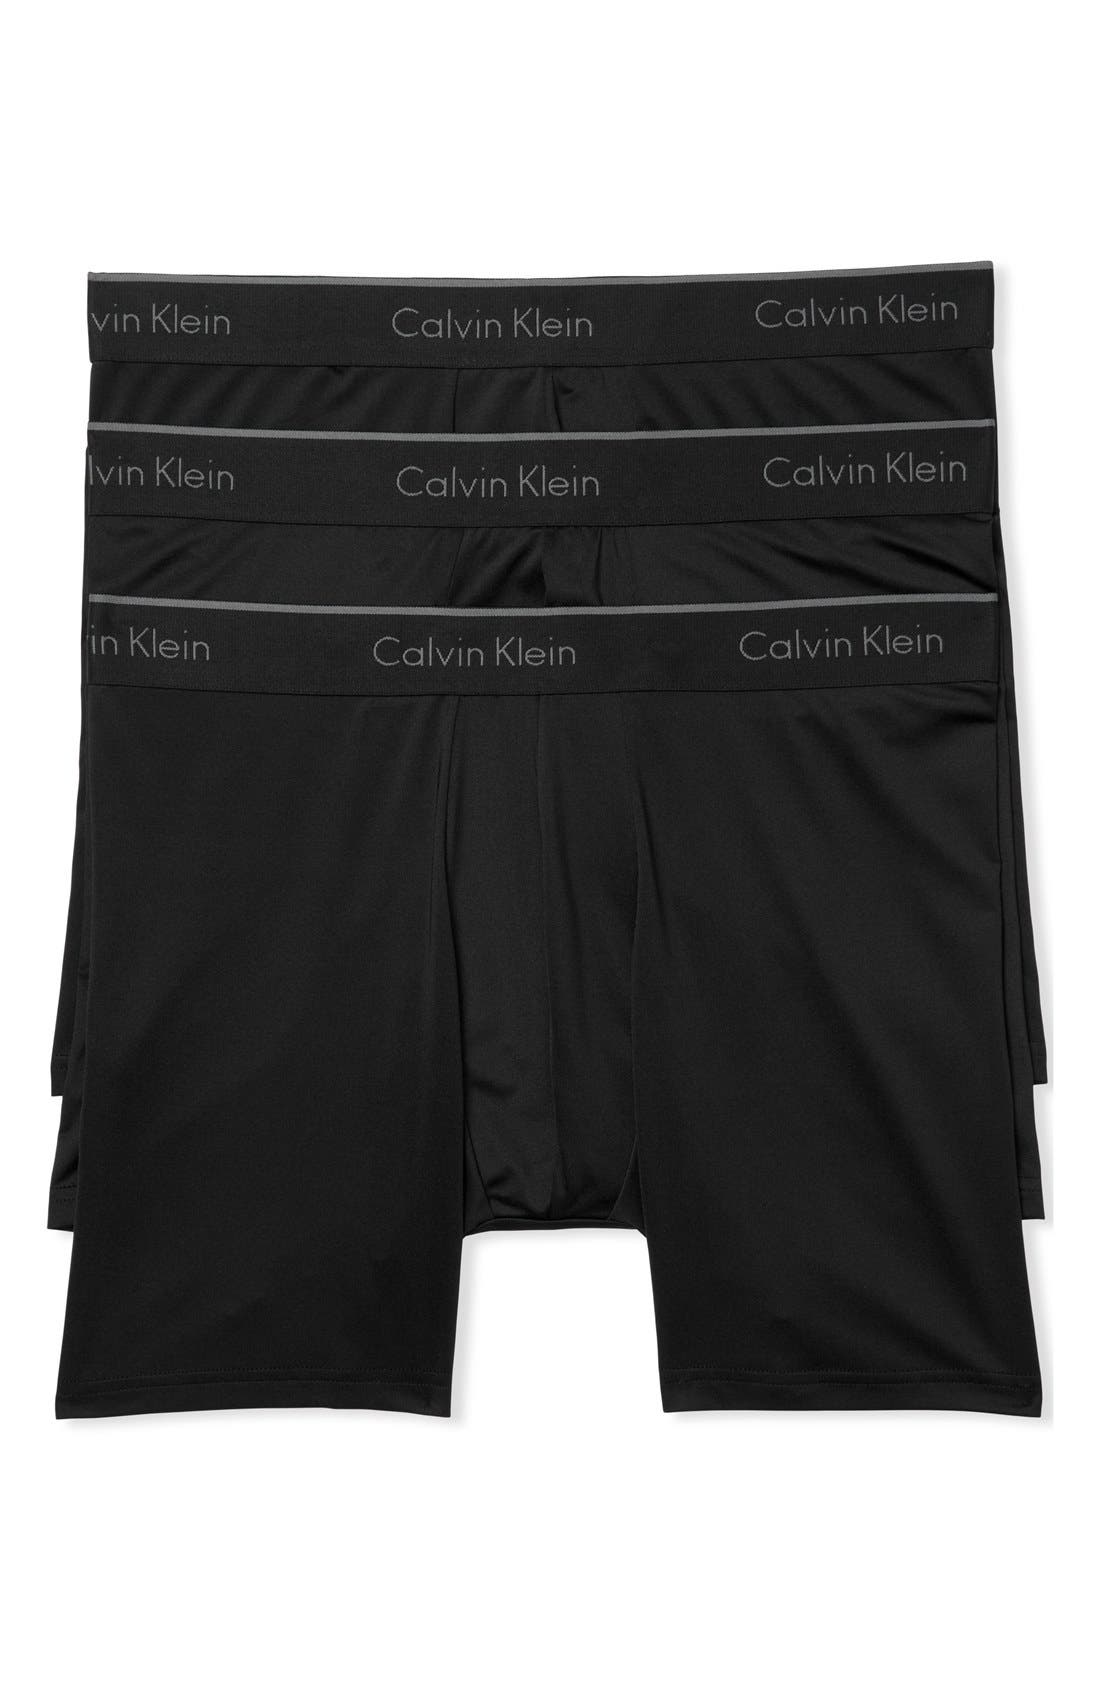 Boxer Briefs for Men, Boxers On Sale, 3 Pack, Dark Navy Blue, Cotton, 2017, XL (EU 6) Ralph Lauren